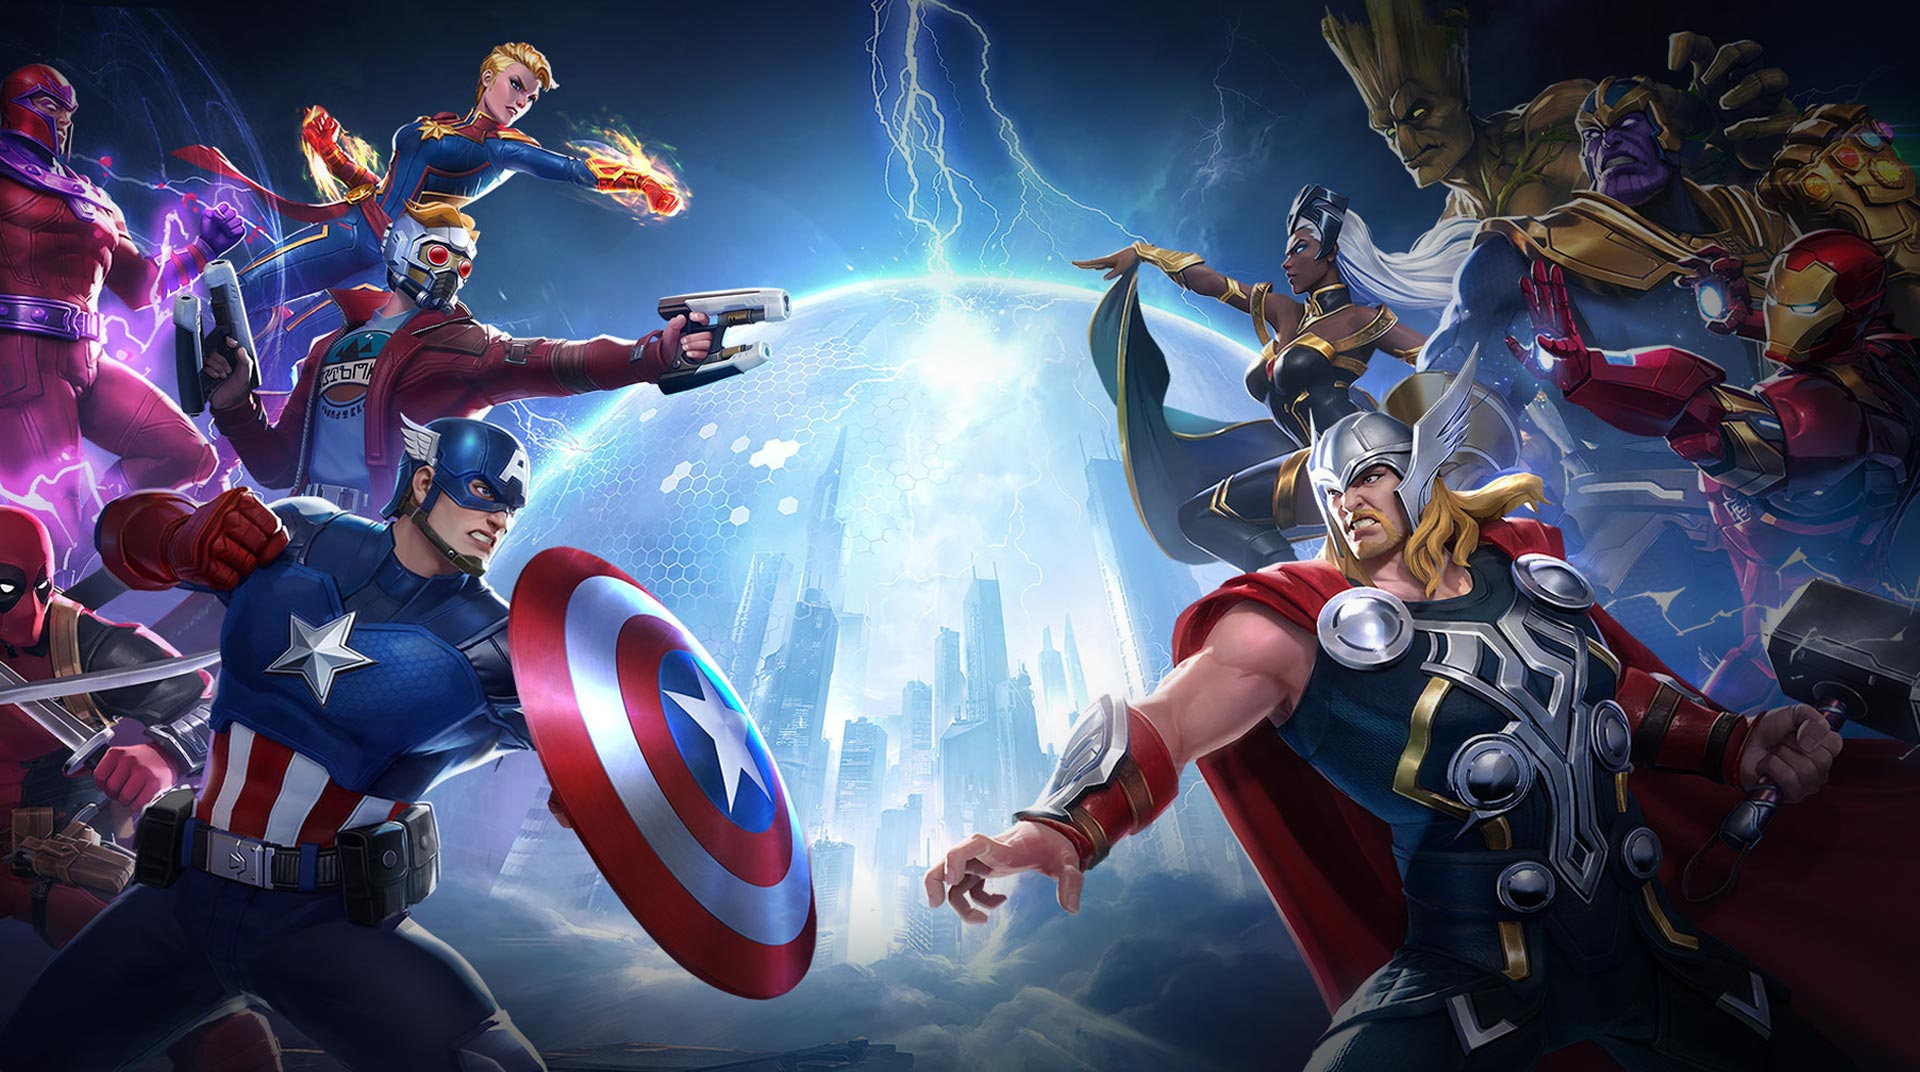 Marvel Super War เกมมือถือแนว MOBA ในจักรวาลมาร์เวลซูเปอร์ฮีโร่